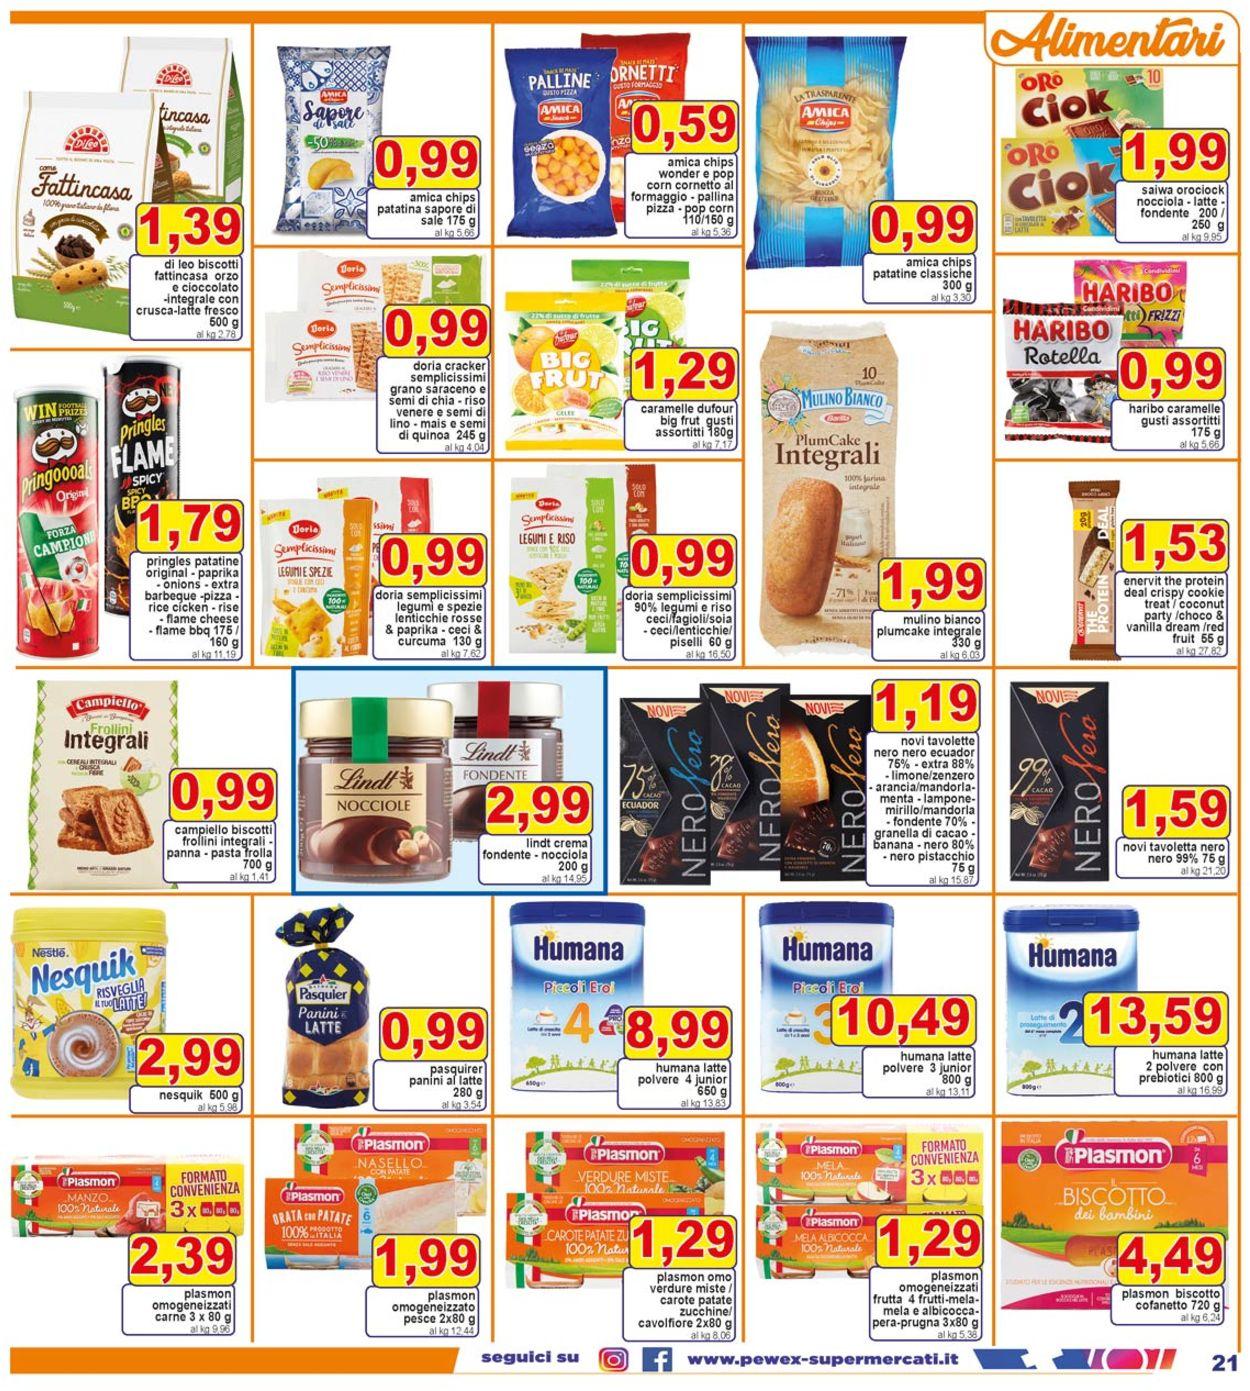 Volantino Pewex - Offerte 28/05-08/06/2021 (Pagina 21)